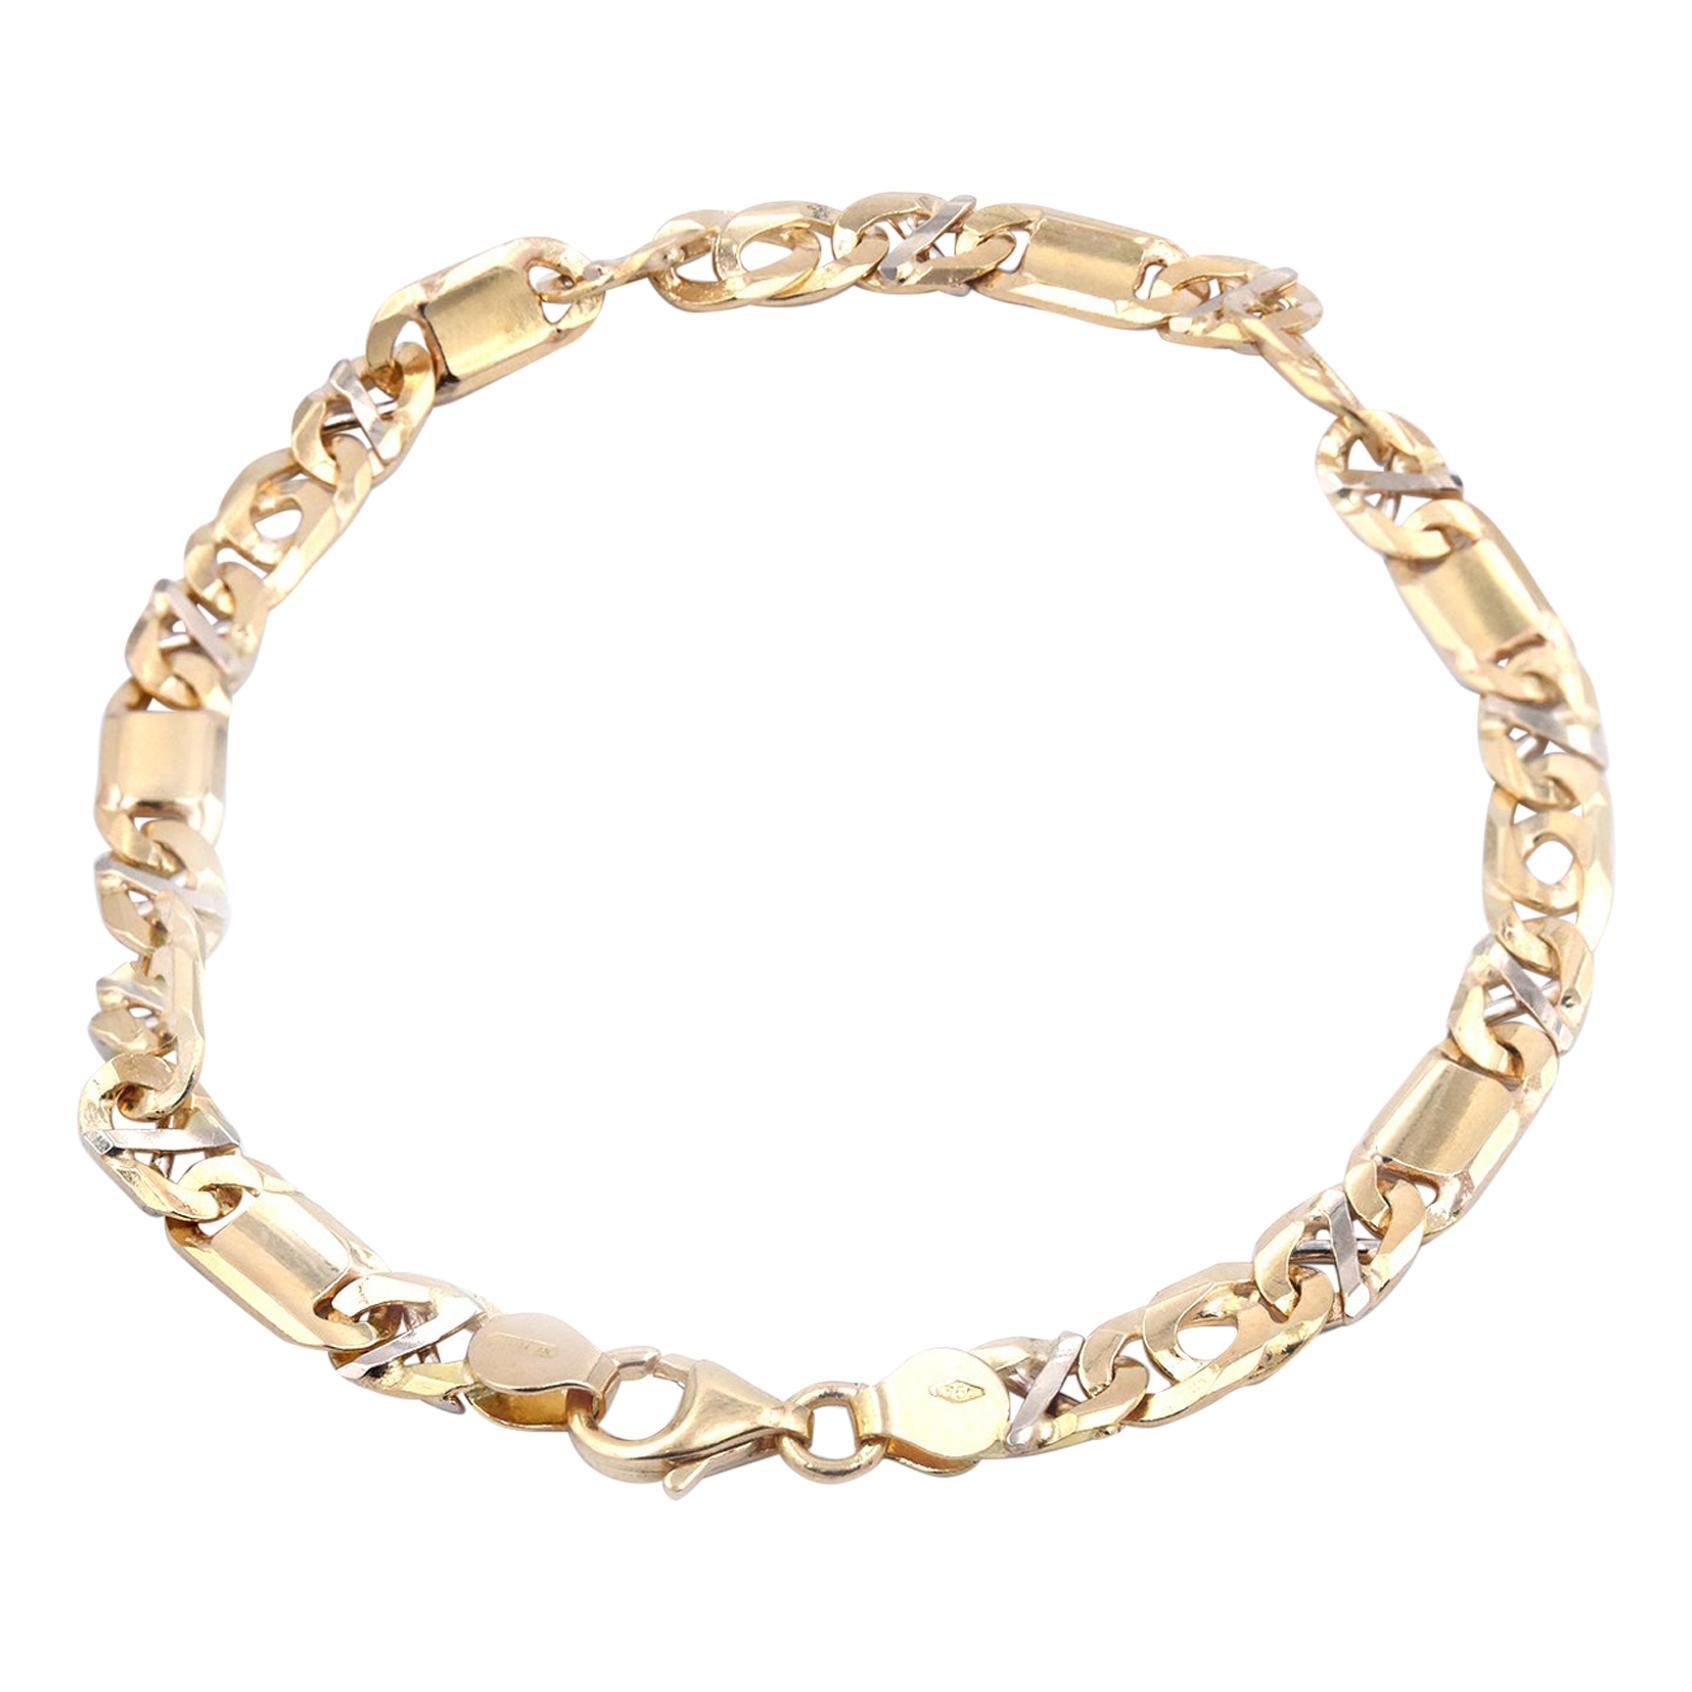 18 Karat Yellow Gold Custom Link Bracelet